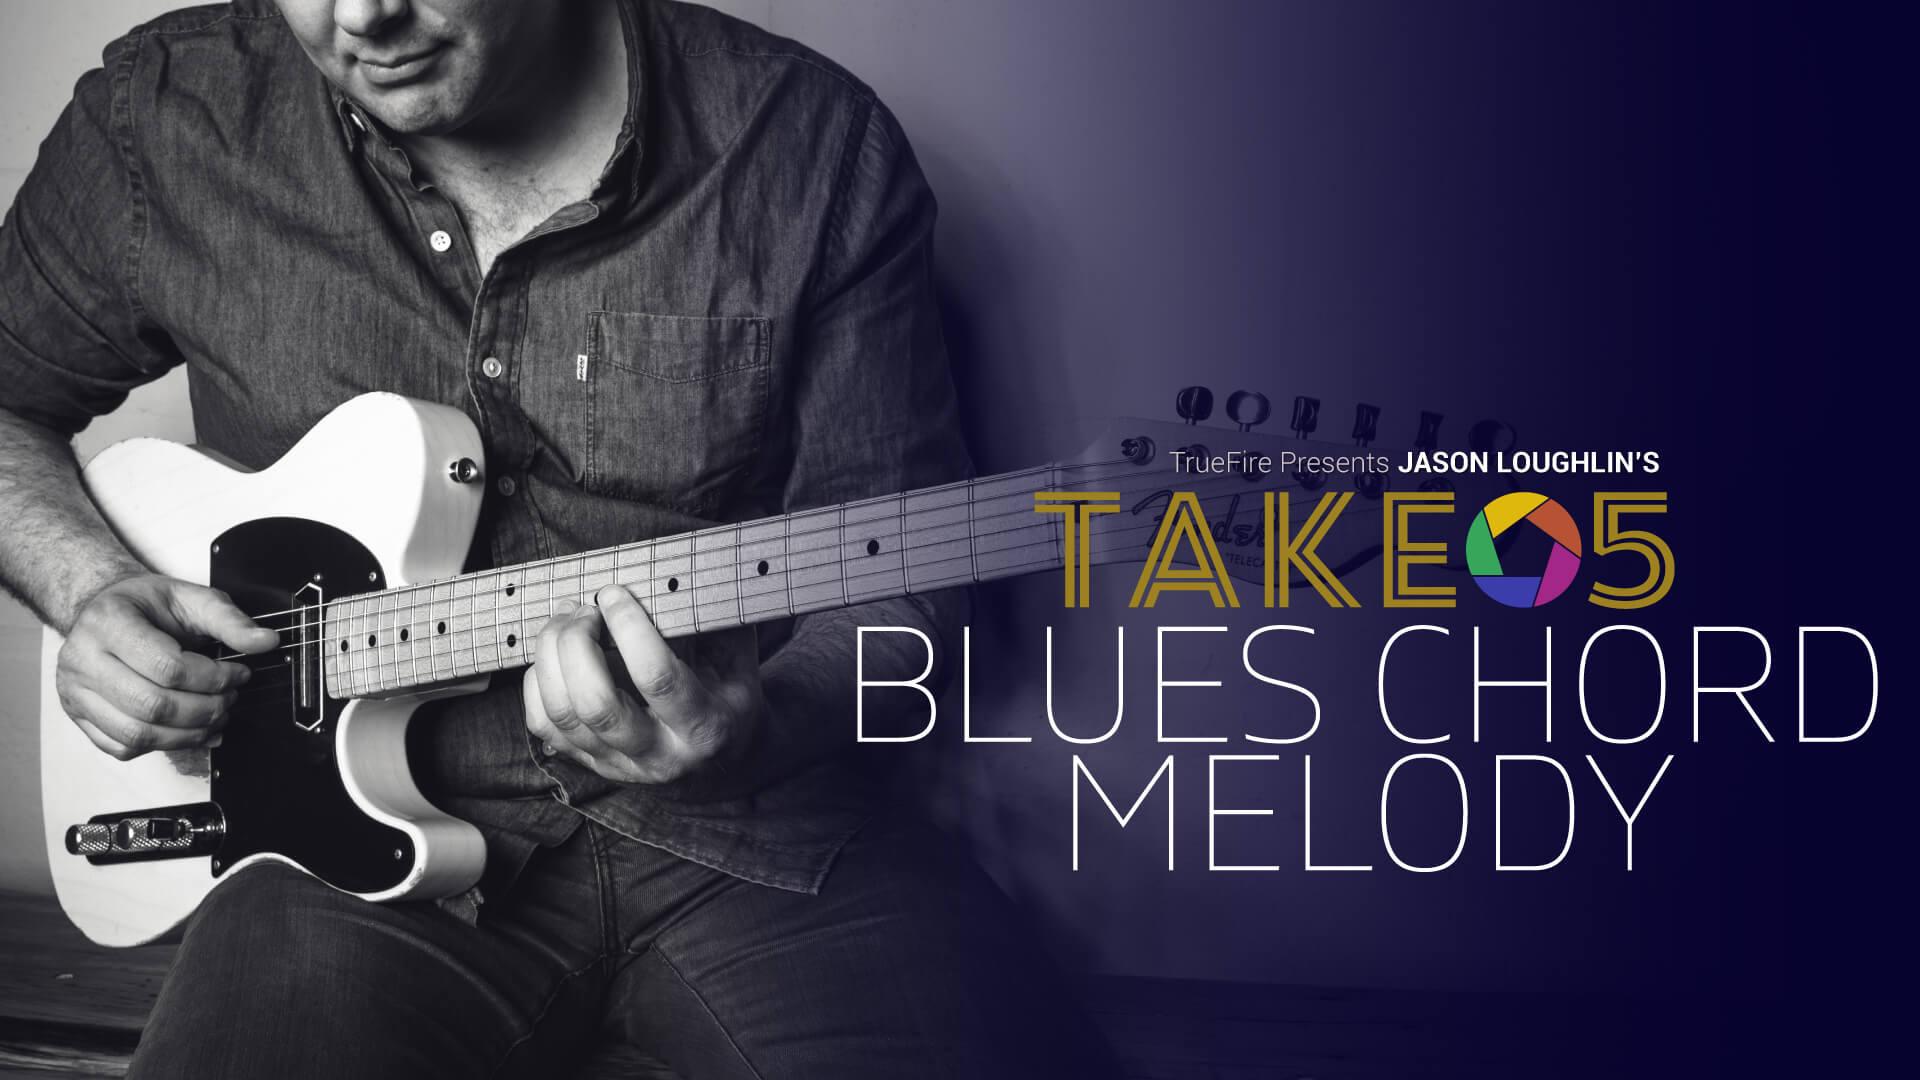 Take 5 Blues Chord Melody Guitar Lessons Jason Loughlin Truefire